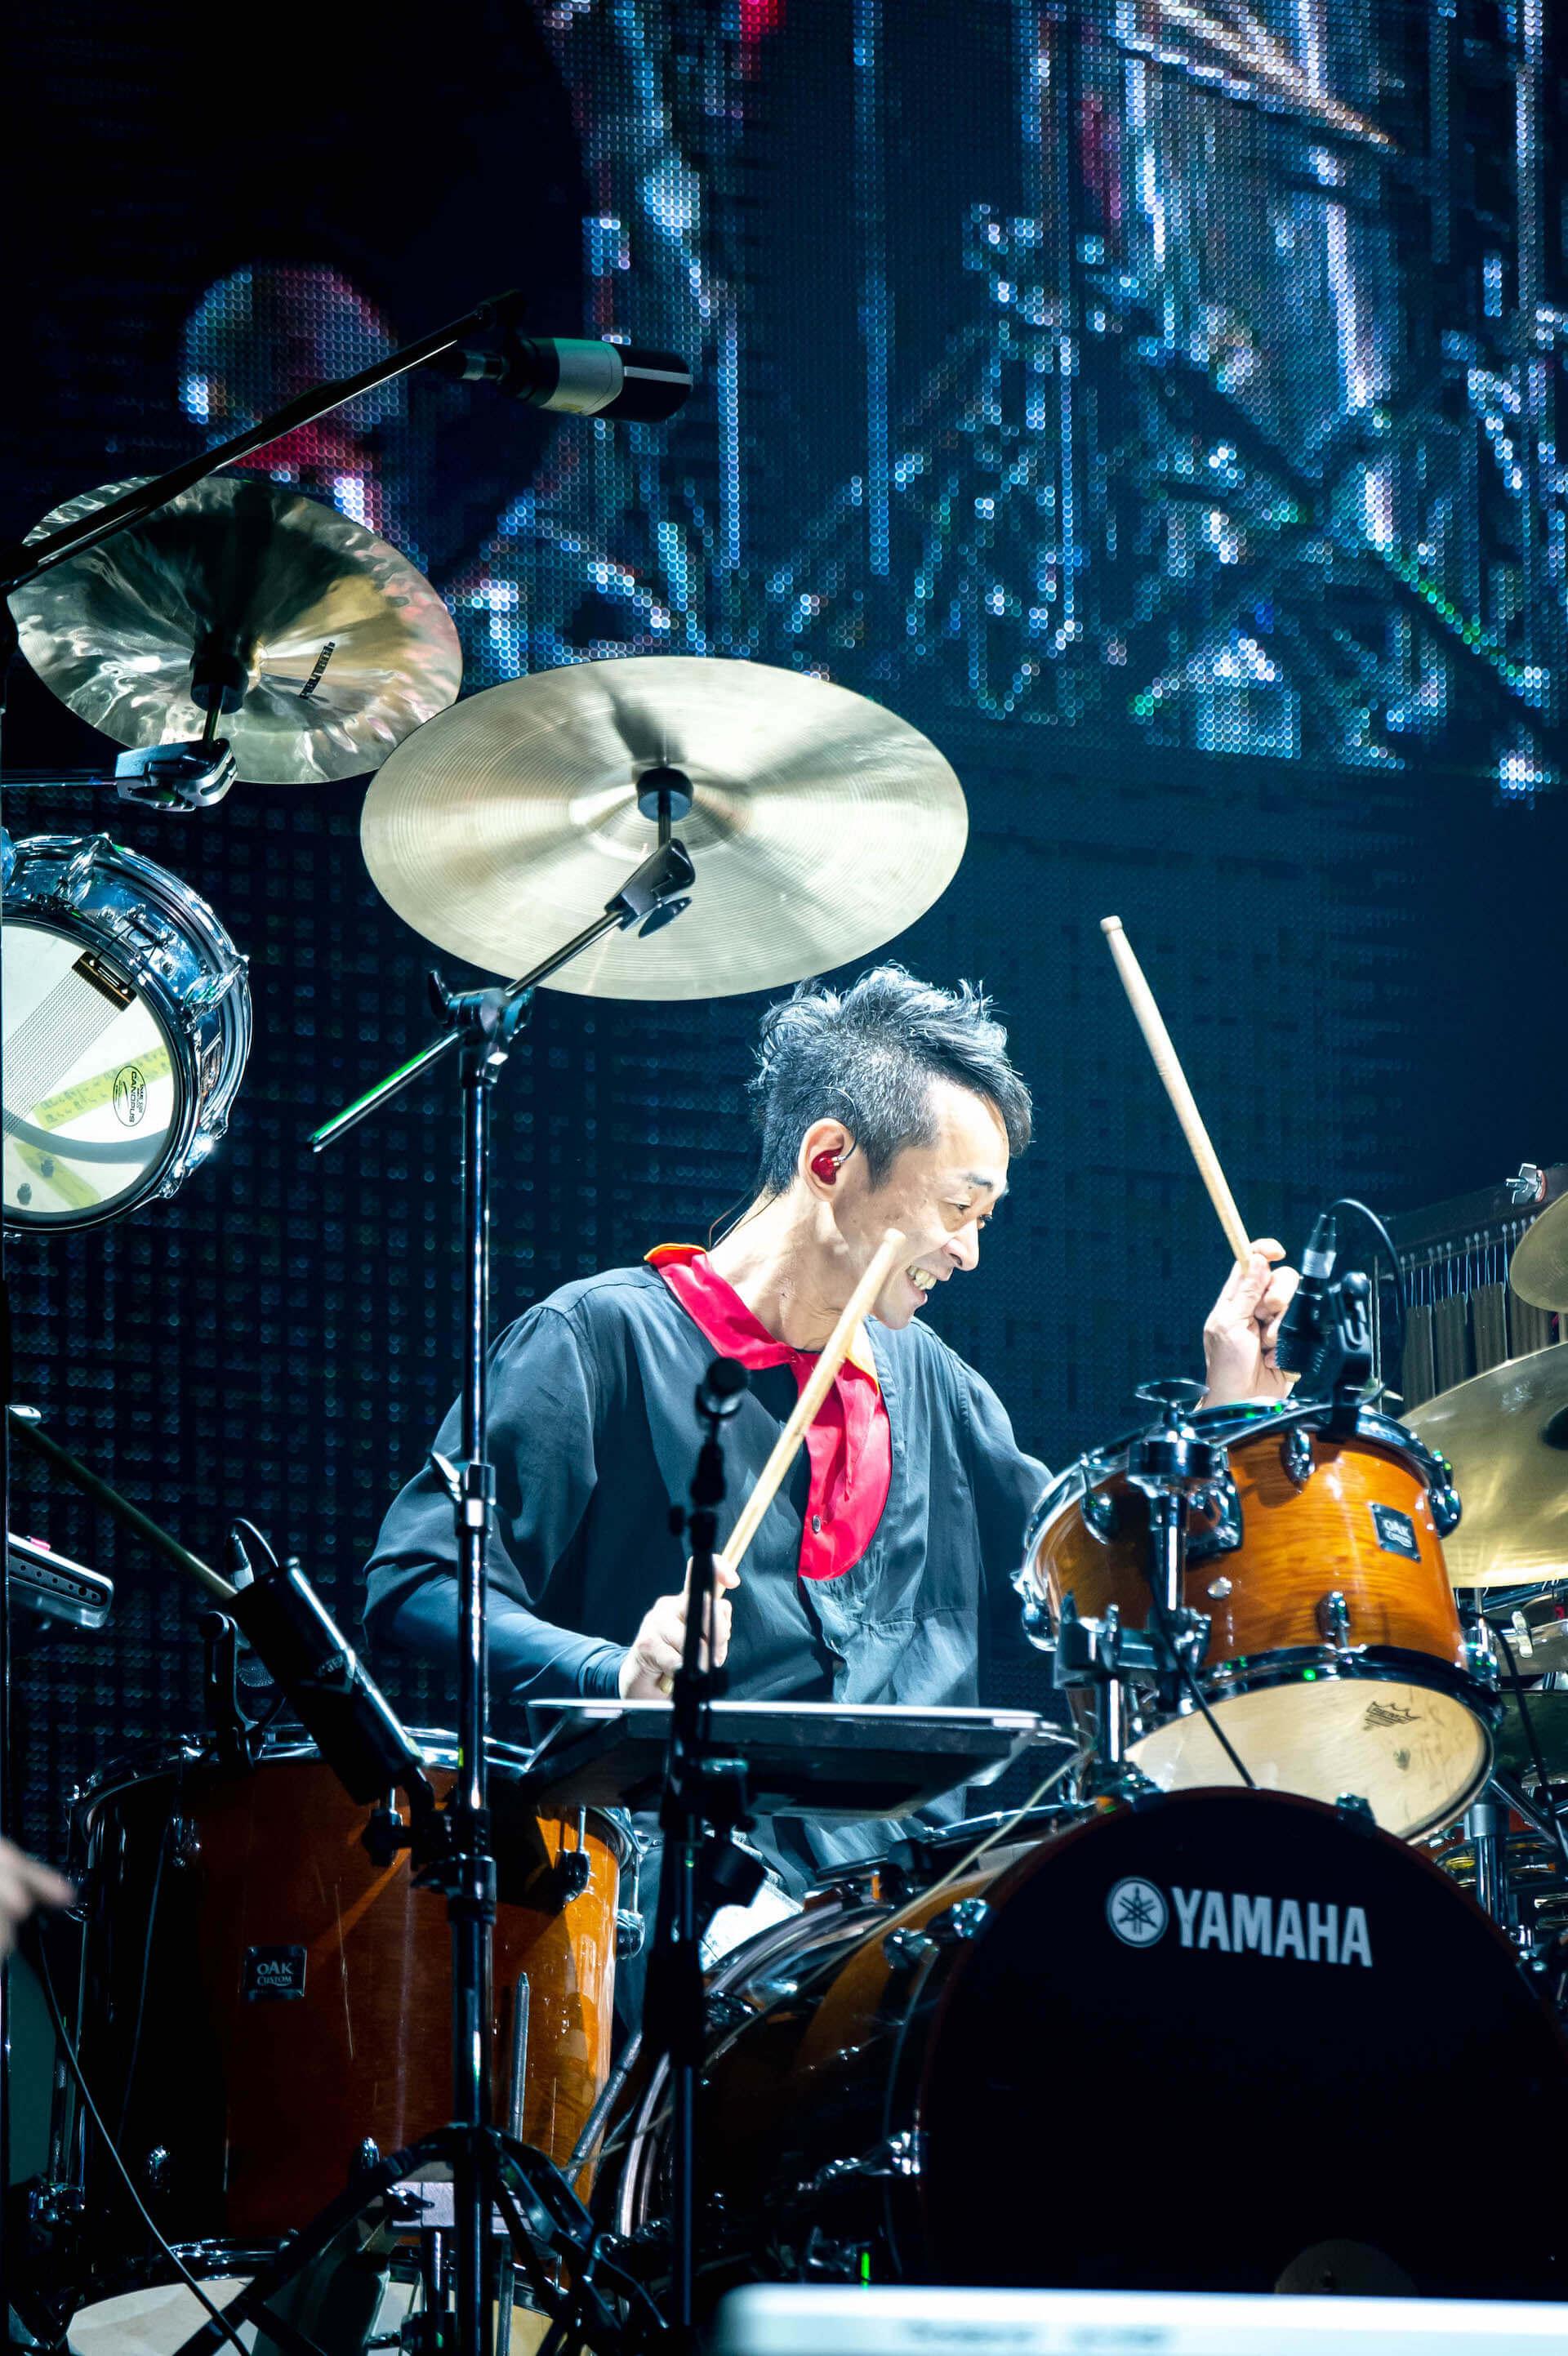 RADWIMPS横浜アリーナ公演のライブ写真が公開!<ANTI ANTI GENERATION TOUR 2019>レポート music190830_radwimps_live_13-1920x2885